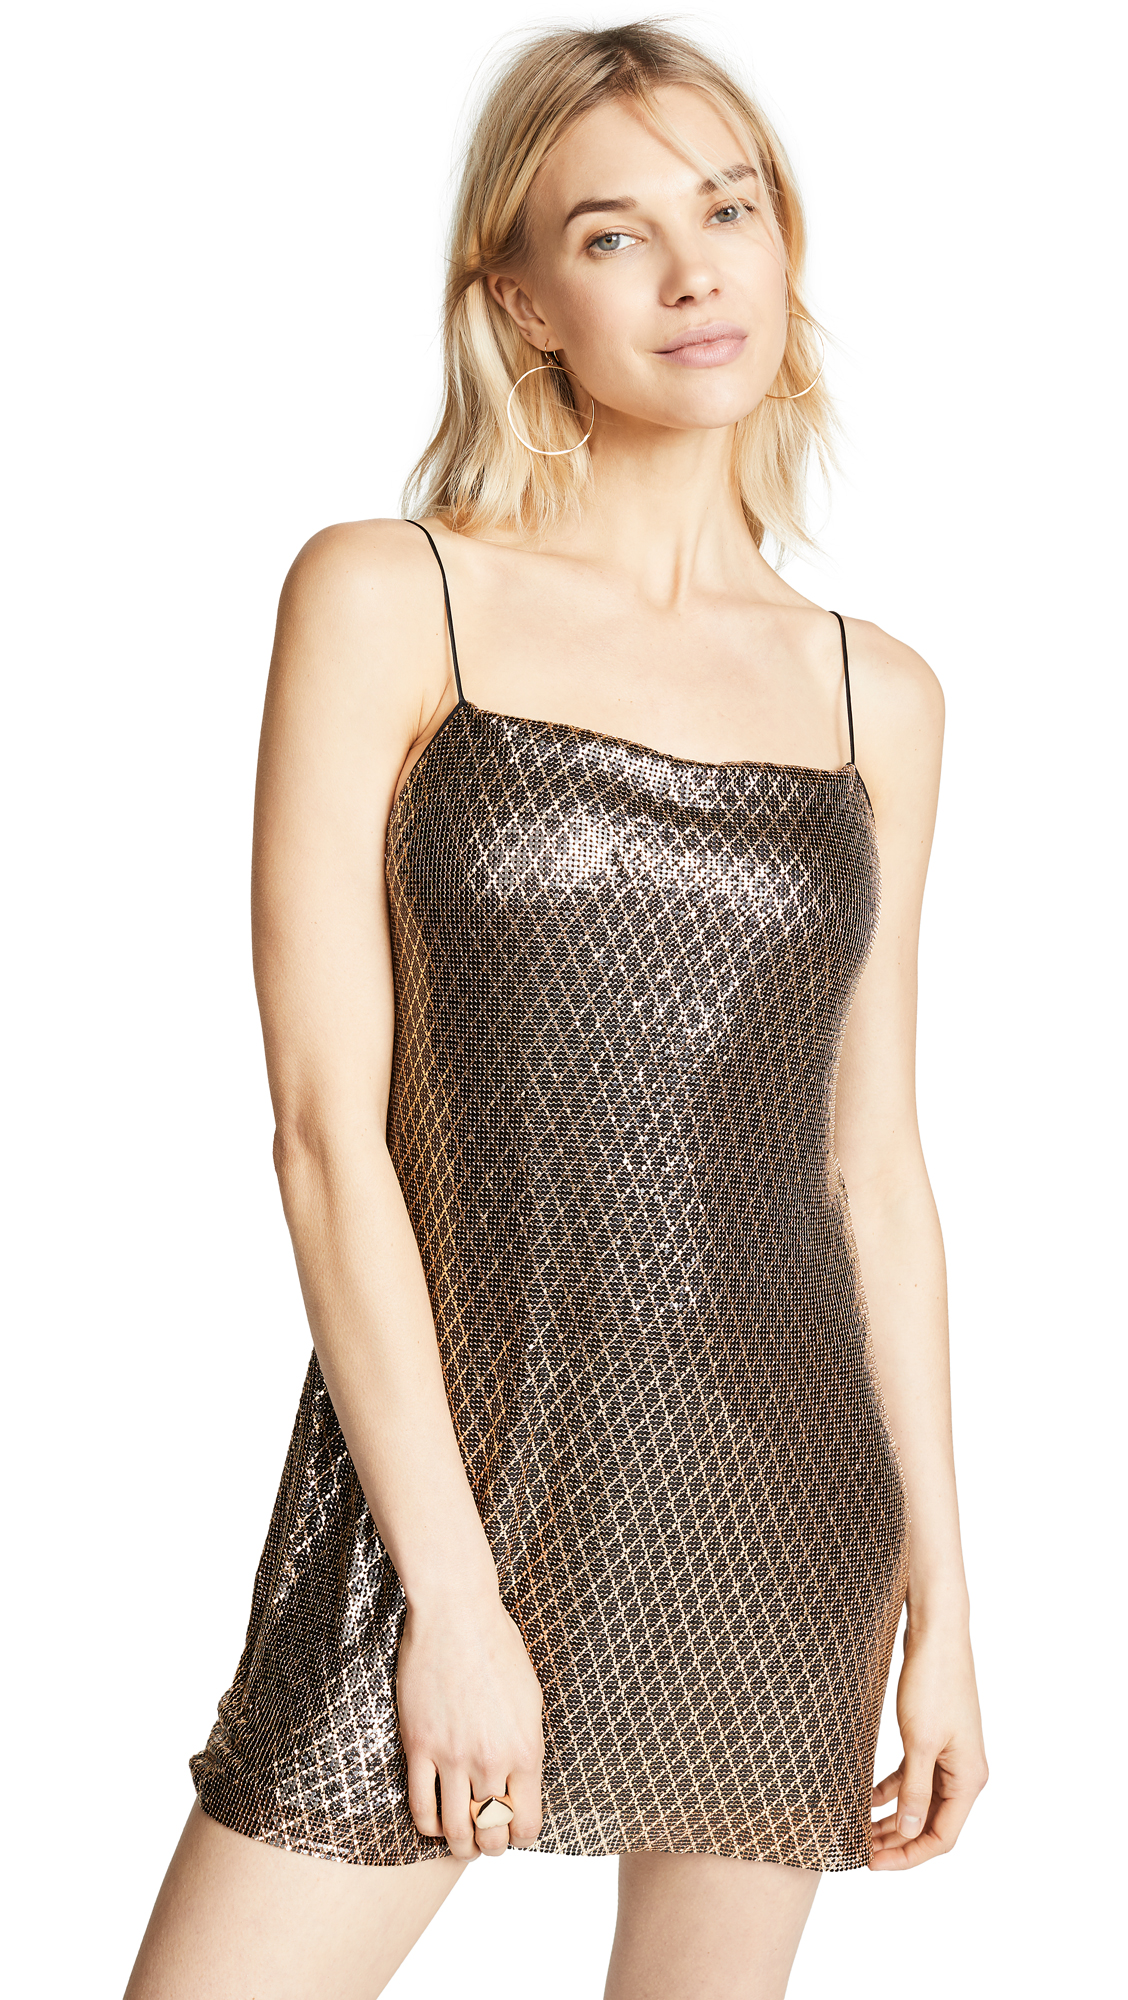 alice + olivia Harmony Chainmail Mini Slip Dress - Black/Gold